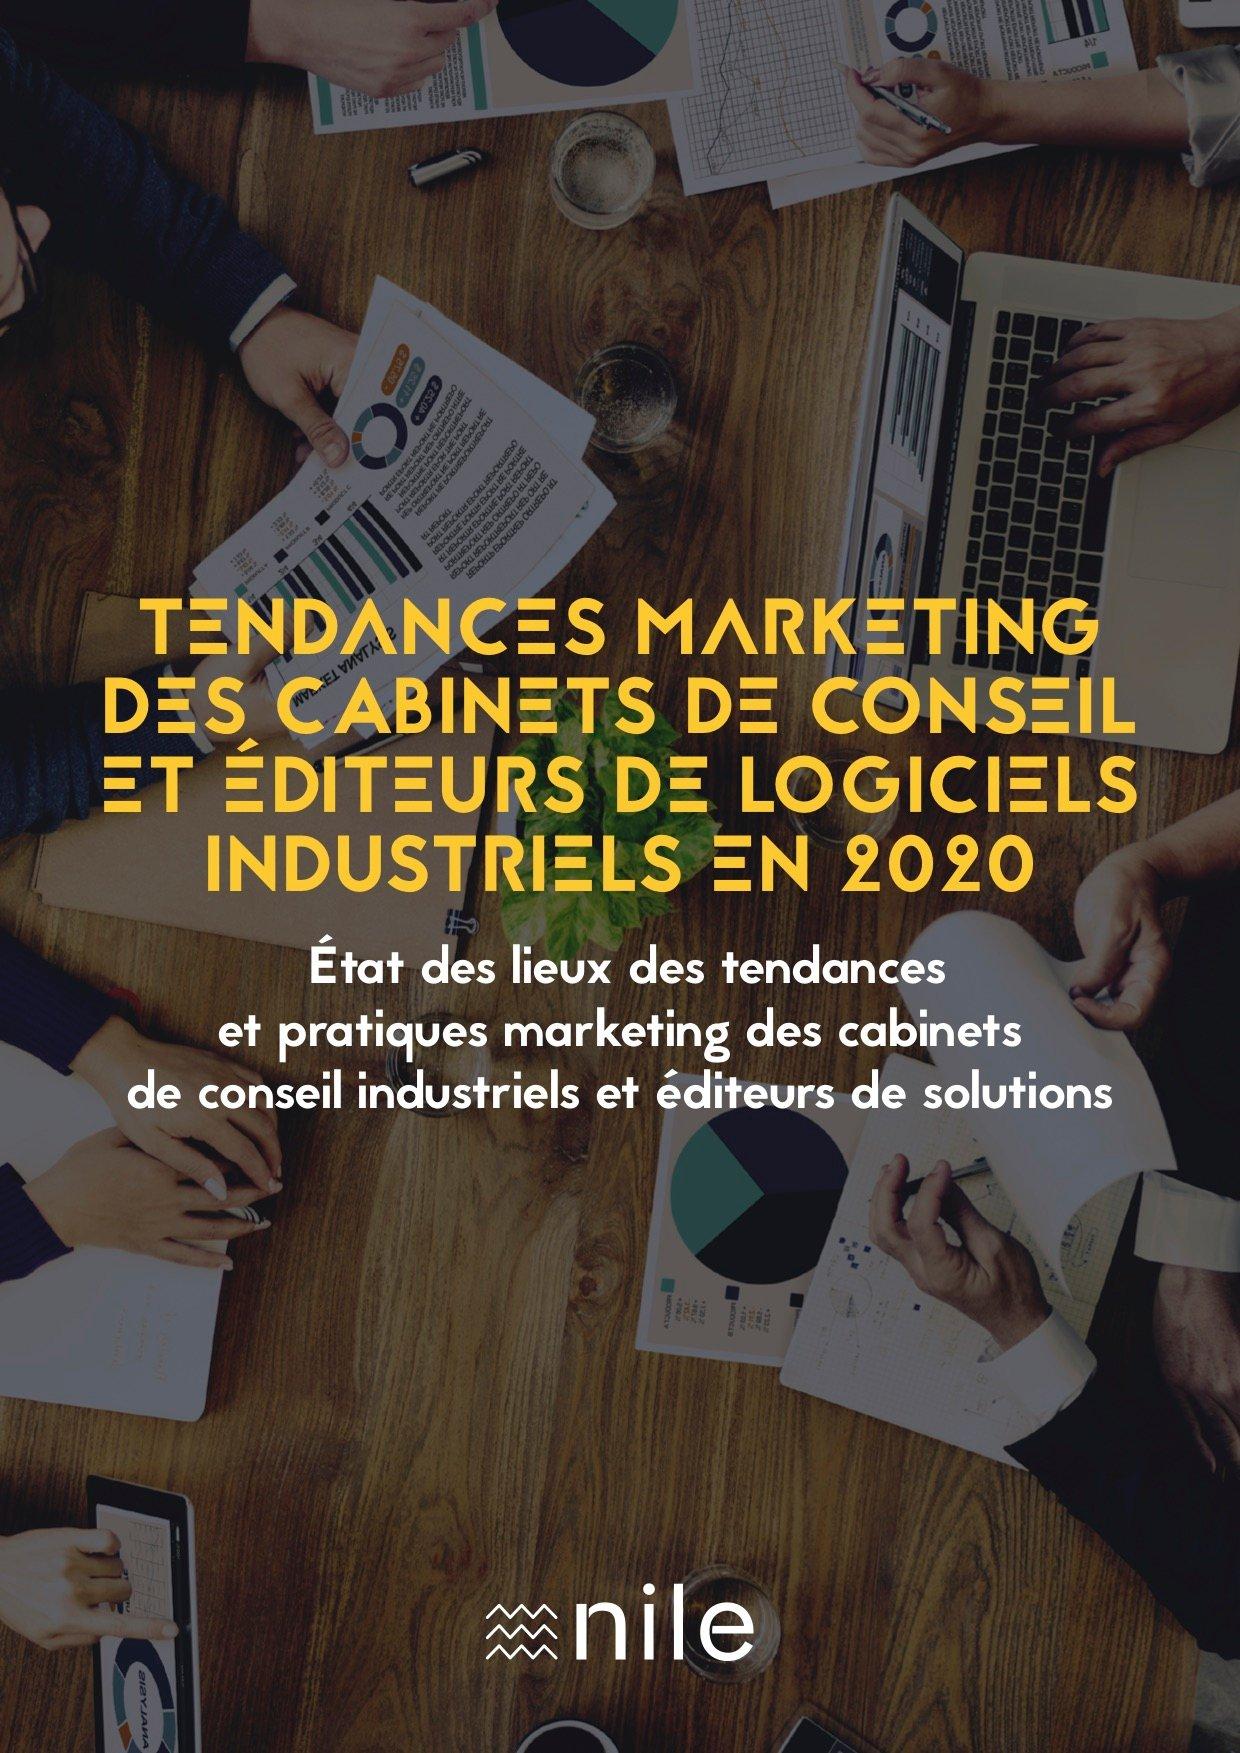 NILE-tendances-marketing-2020-cabinet-conseil-industrie